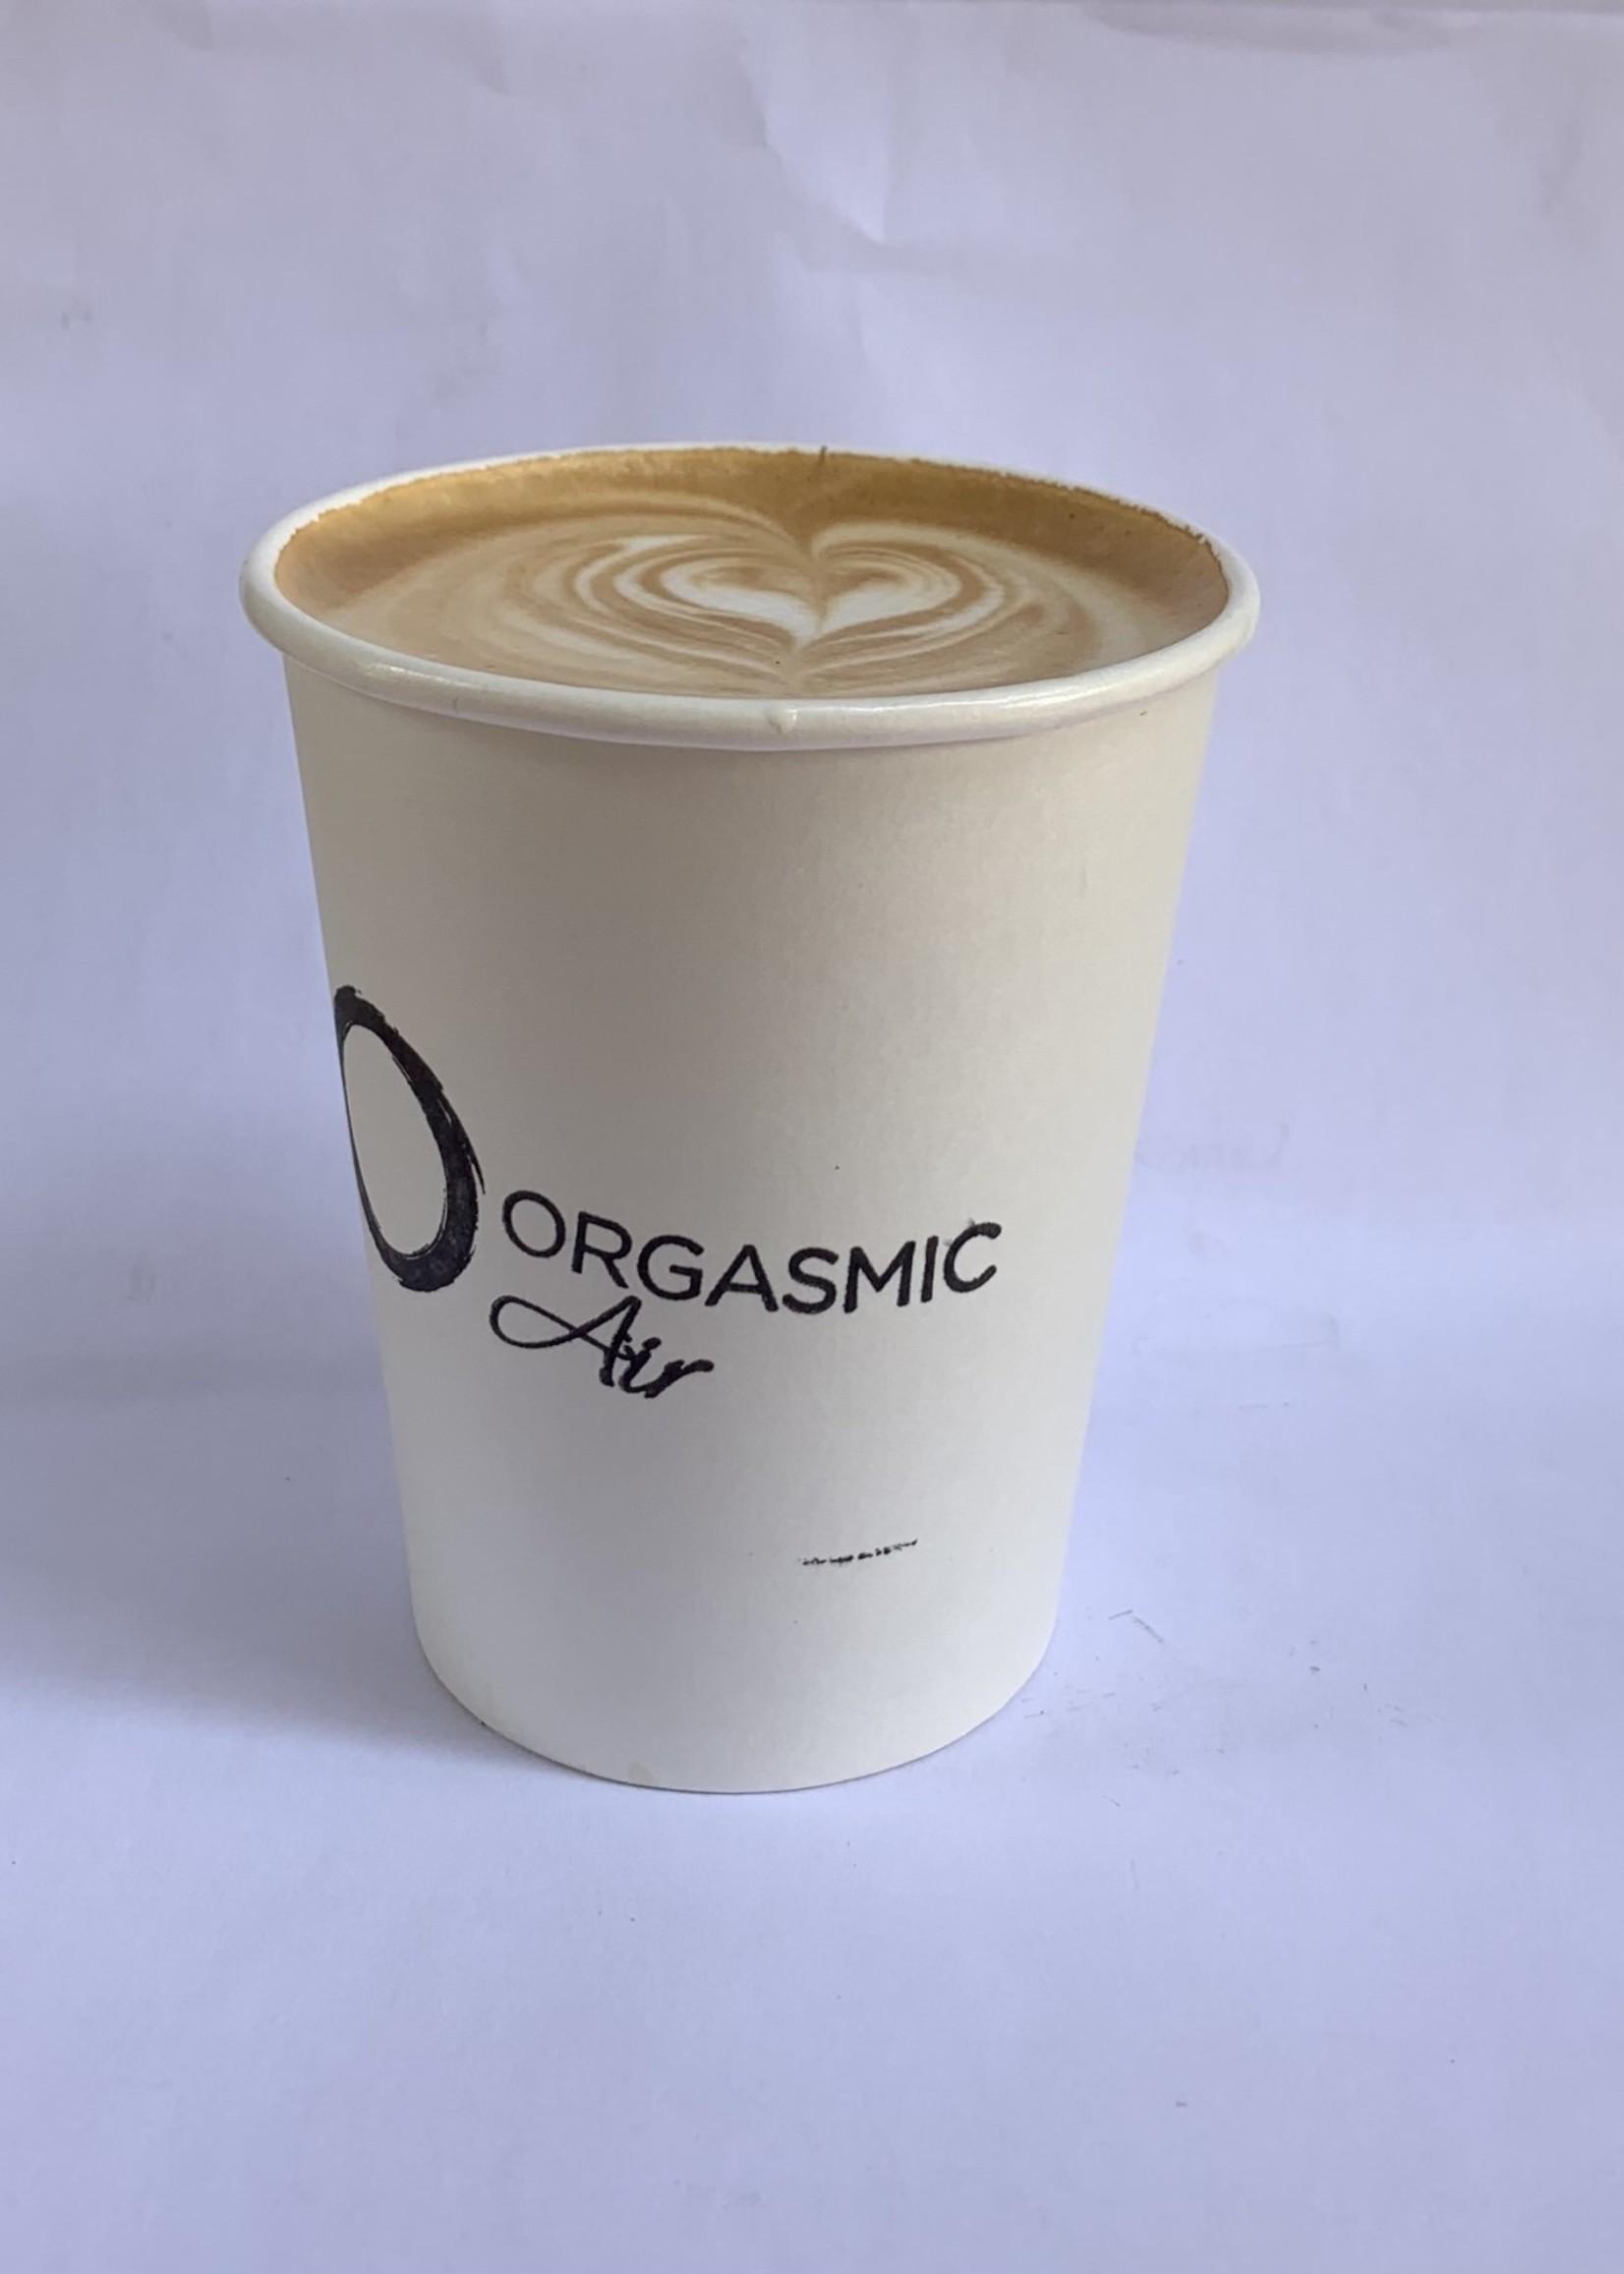 Organic & Air Cappuccino